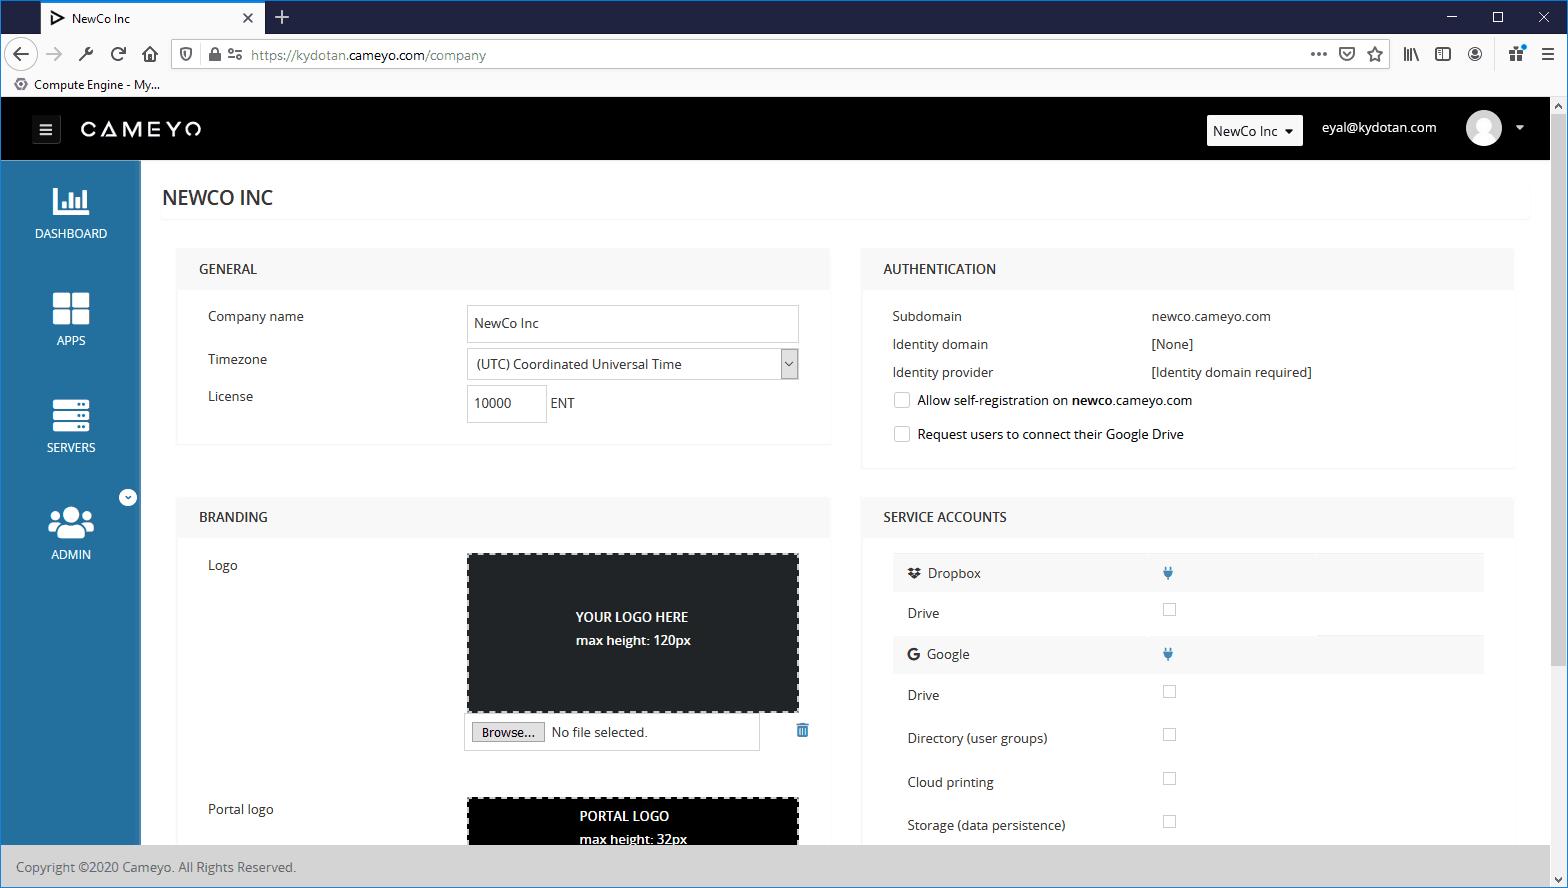 Cameyo for MSPs client dashboard screenshot